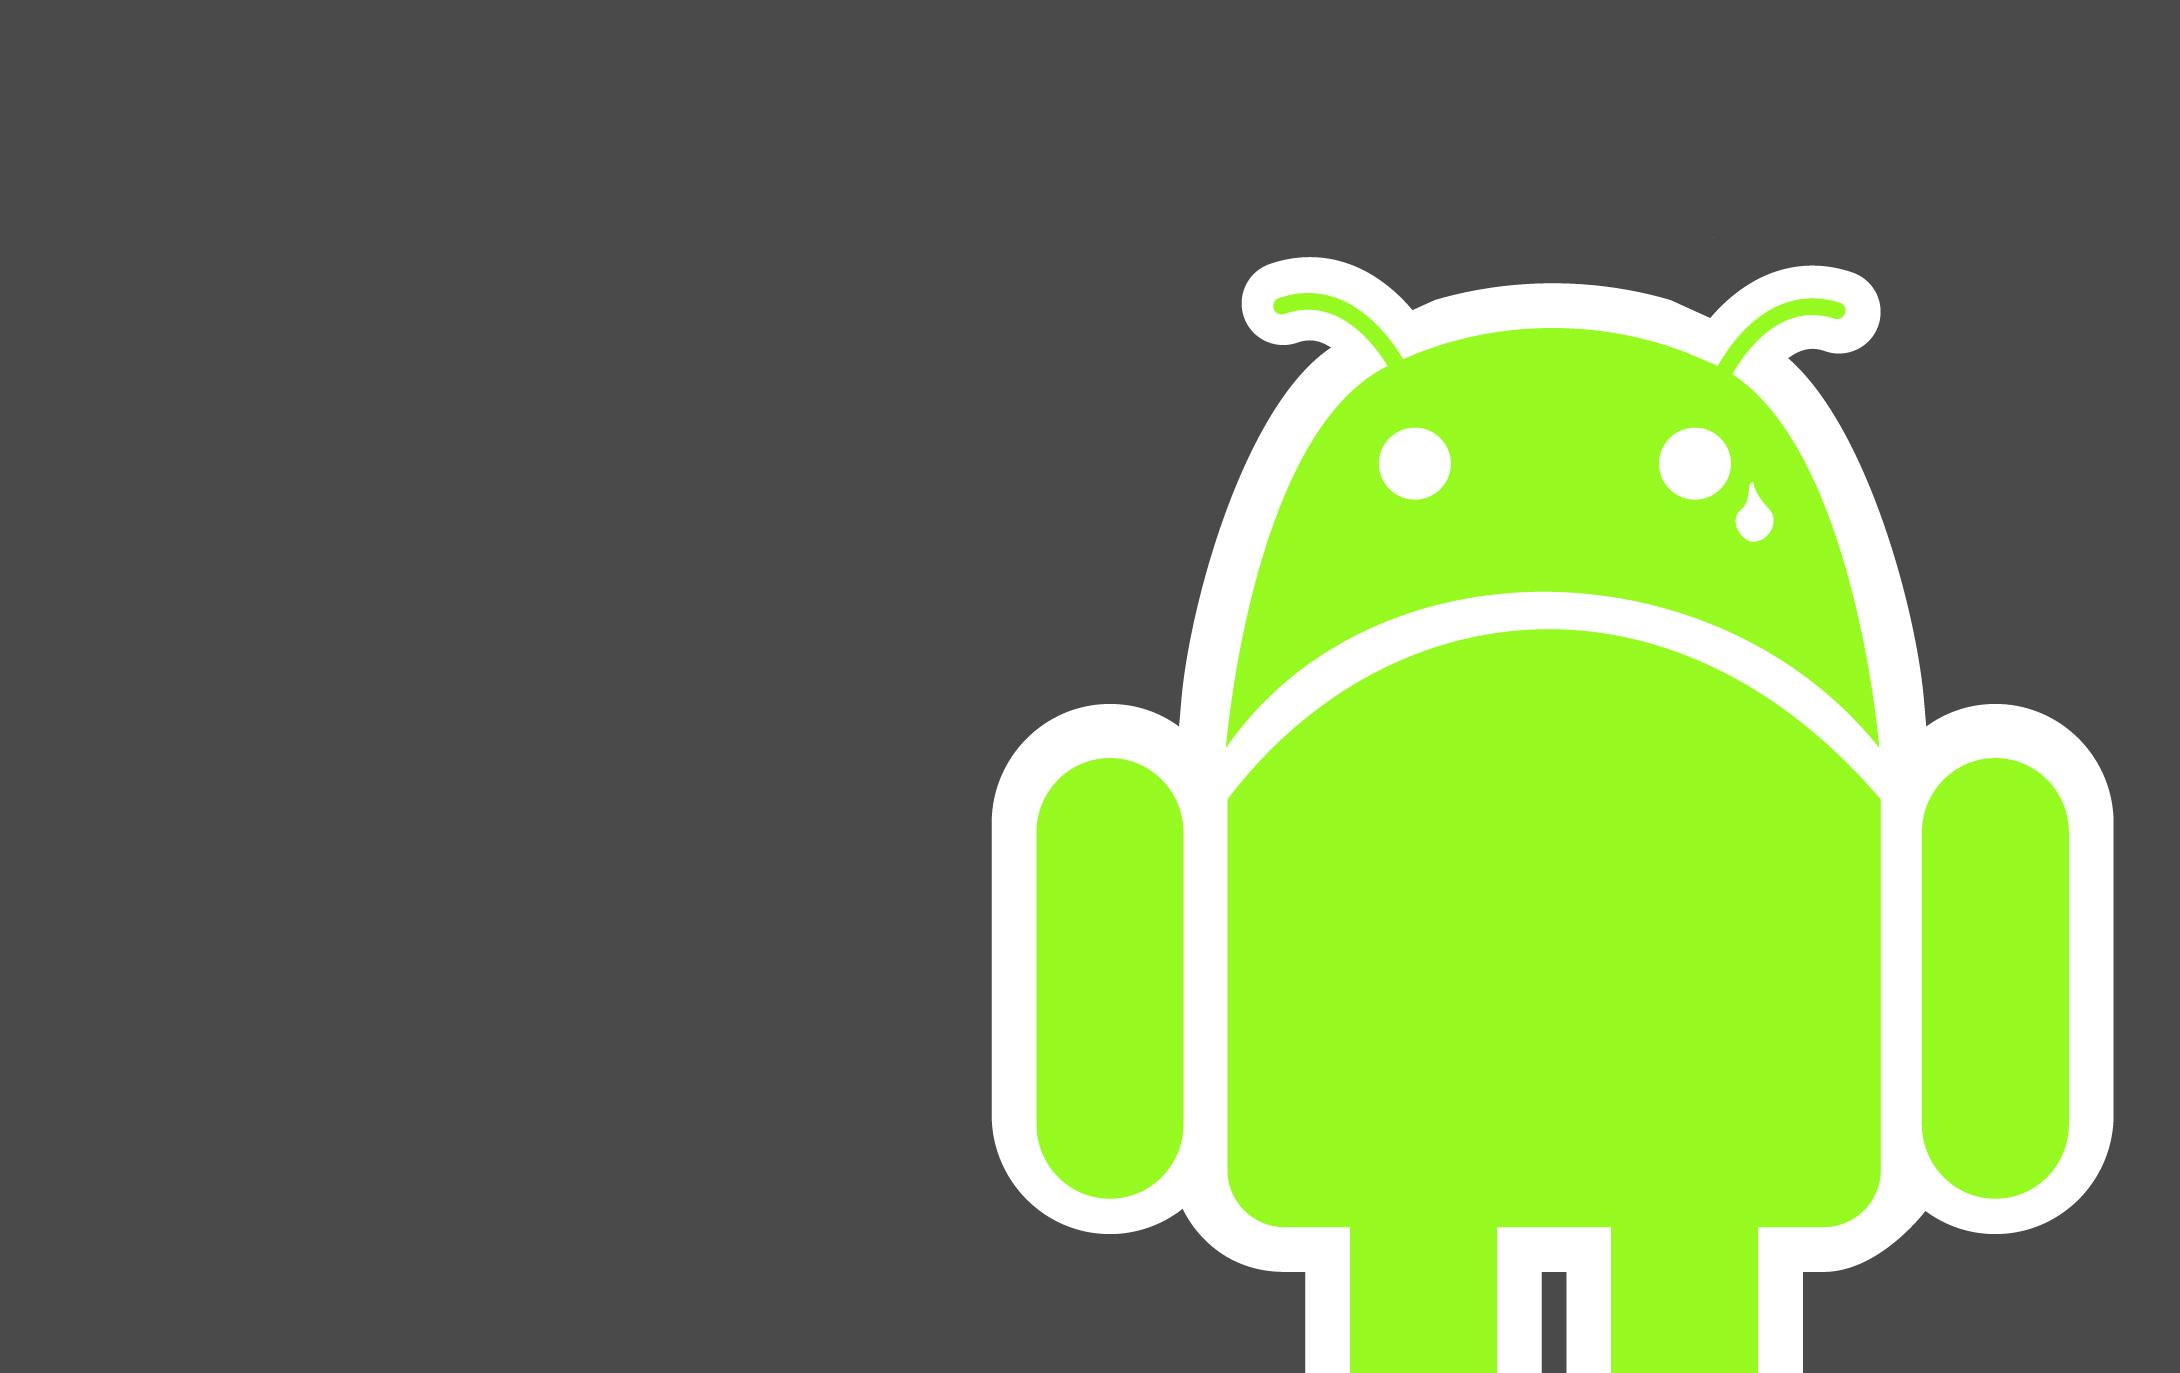 Android auzitara doa!  Orduan, zergatik?